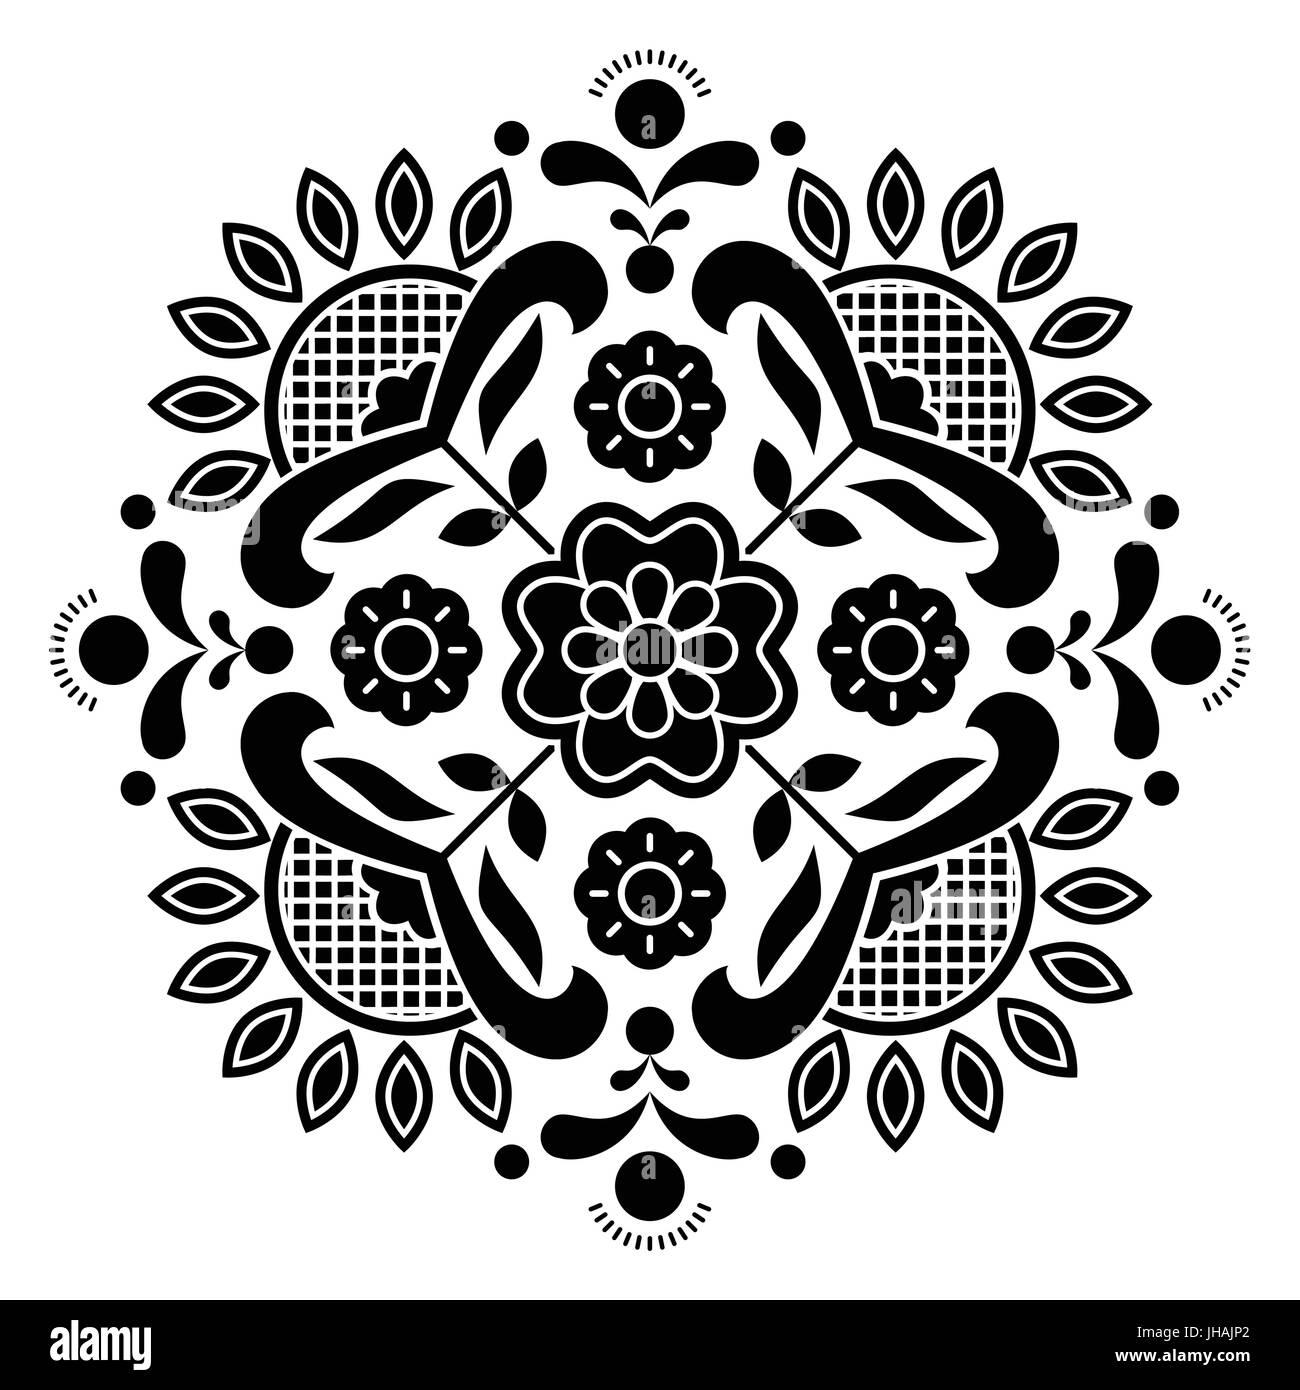 Norwegian black folk art Bunad pattern - Rosemaling style embroidery Stock Vector